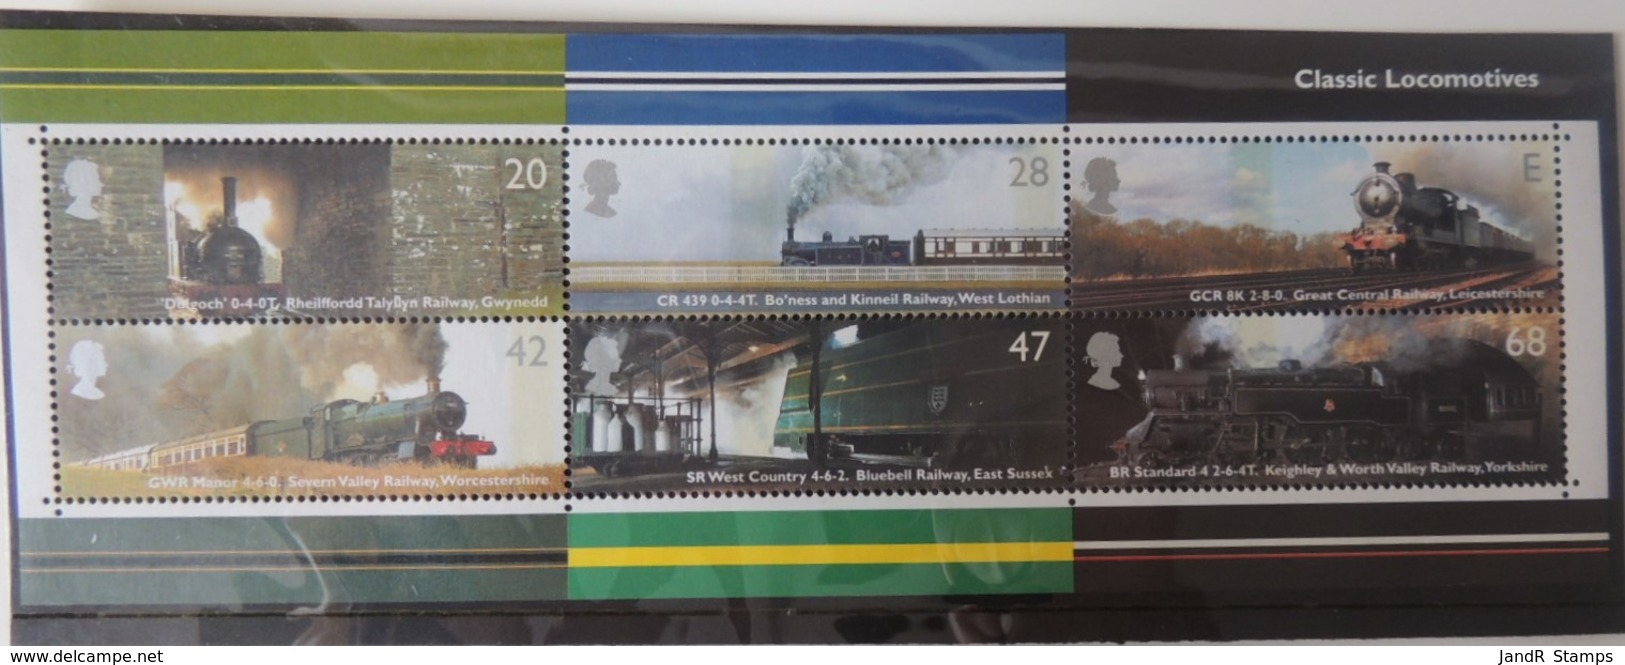 GREAT BRITAIN 2004 CLASSIC LOCOMOTIVES MINIATURE SHEET MS2423 UNMOUNTED MINT RAILWAYS TRAINS - 1952-.... (Elizabeth II)